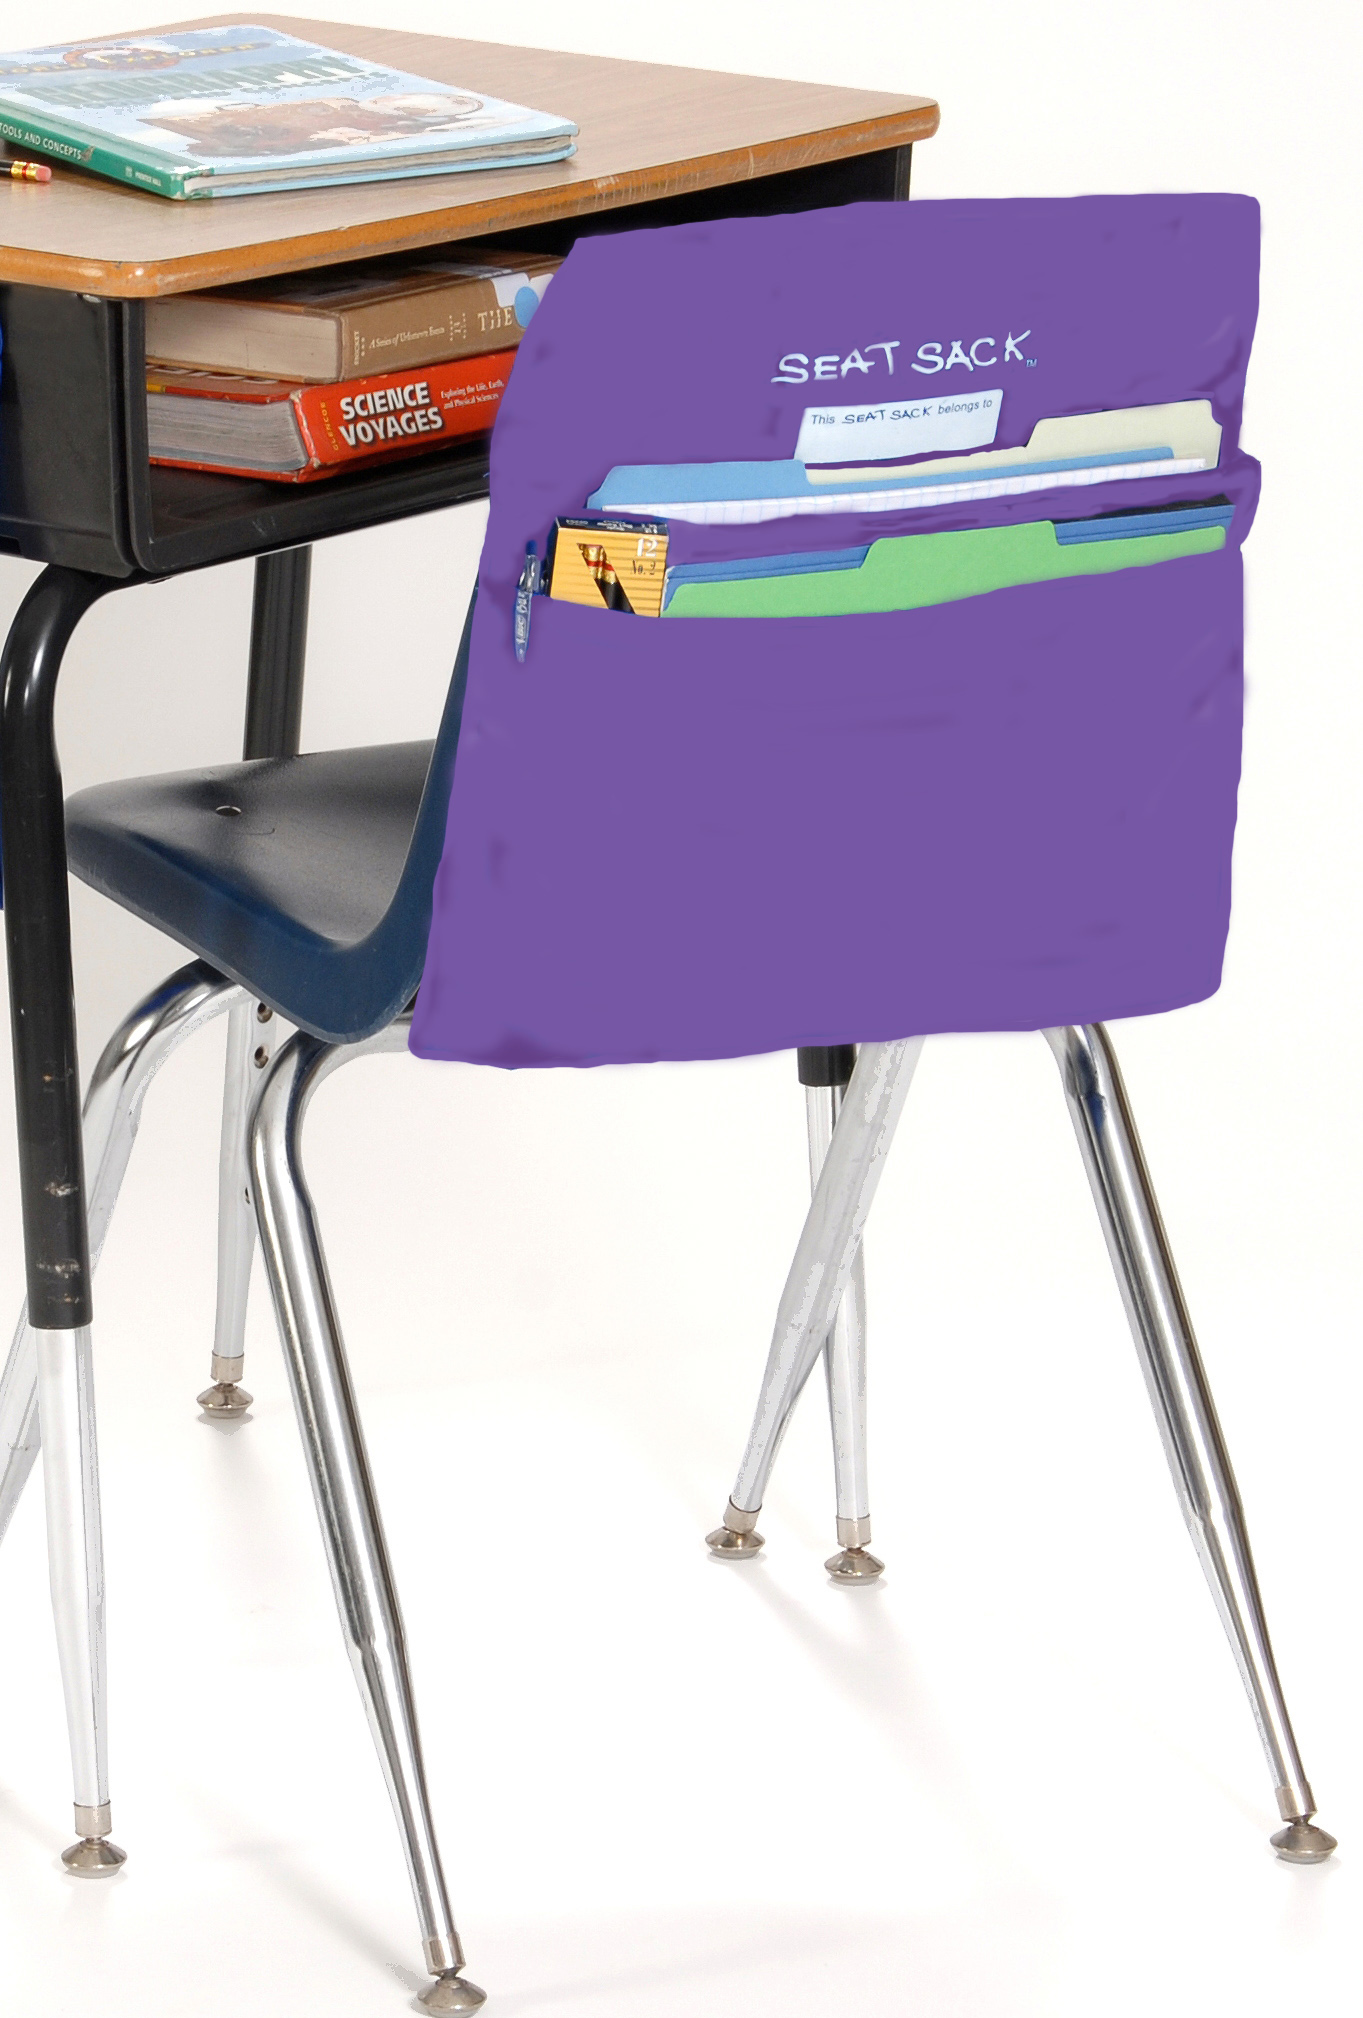 Back To School Desk Organizer Royally Purple Seat SackSeat Sack Chair  Pocket Organizer In Royal Purple